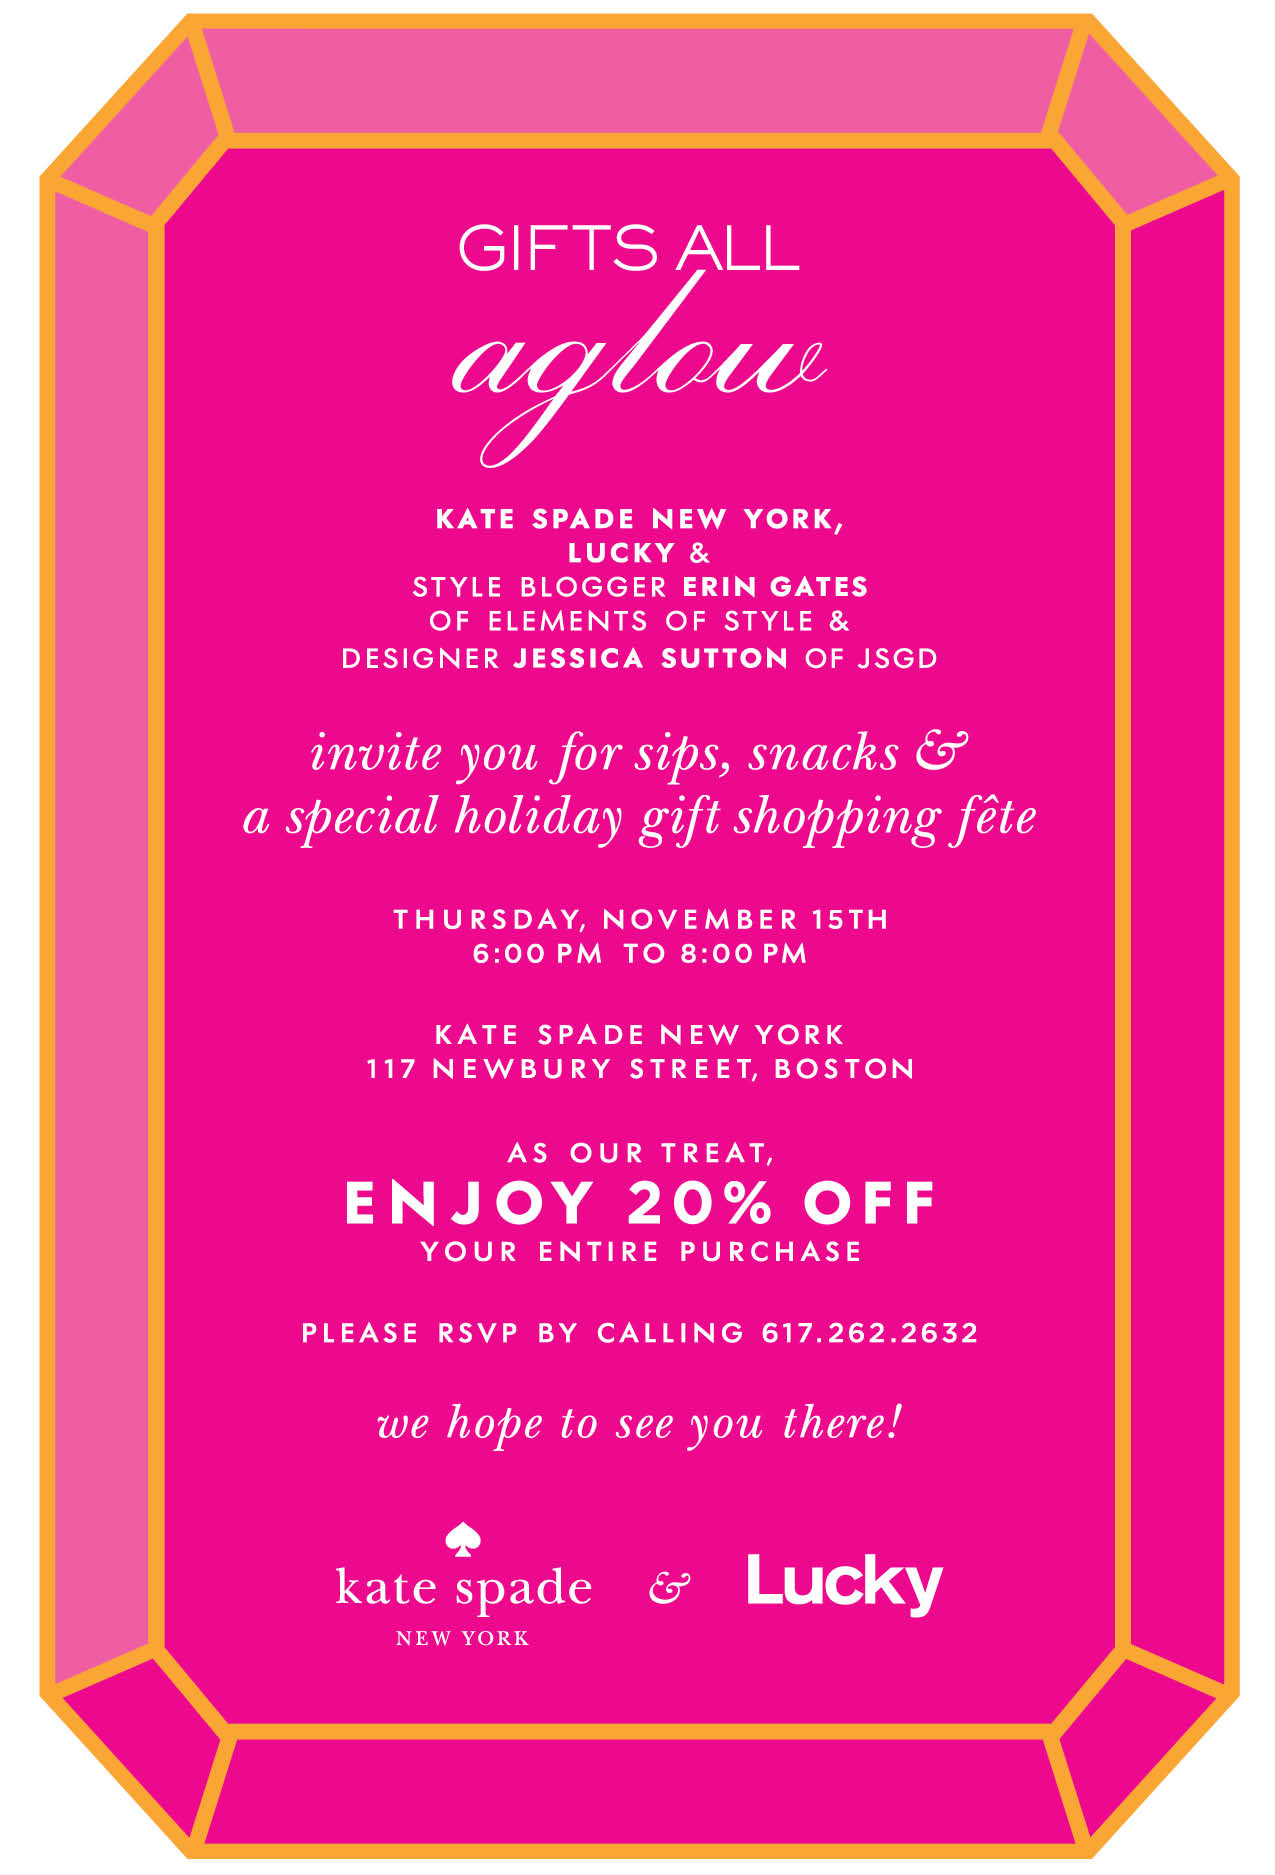 Kate Spade Card Quotes. QuotesGram